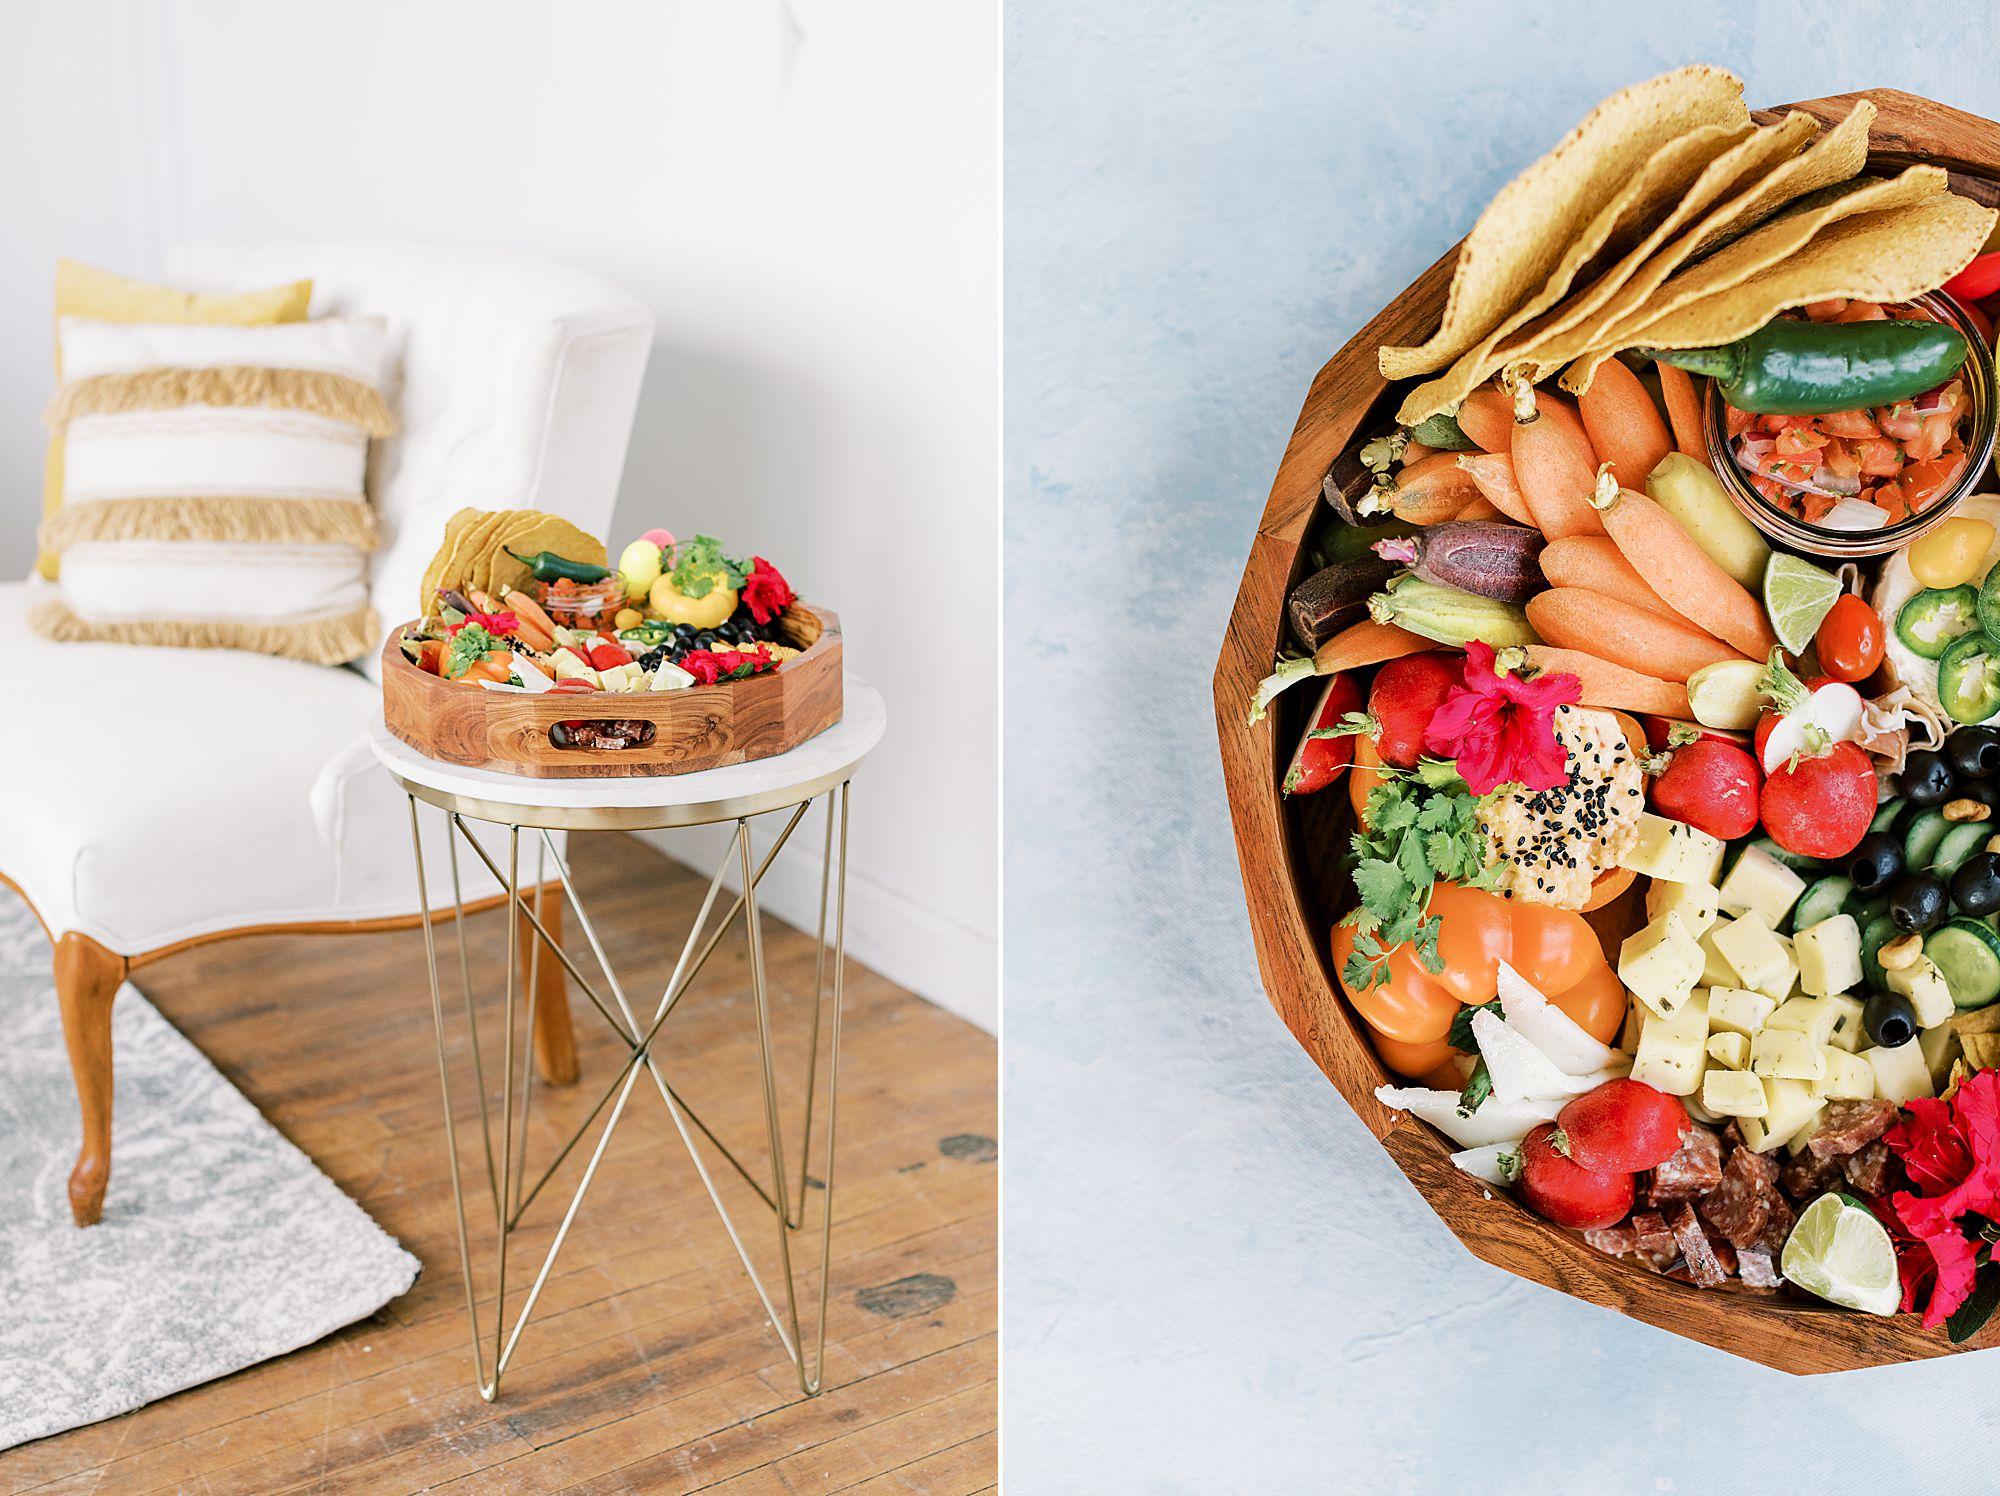 Cinco De Mayo Inspiration for Your FIesta - Party Crush Studio and Ashley Baumgartner_0004.jpg